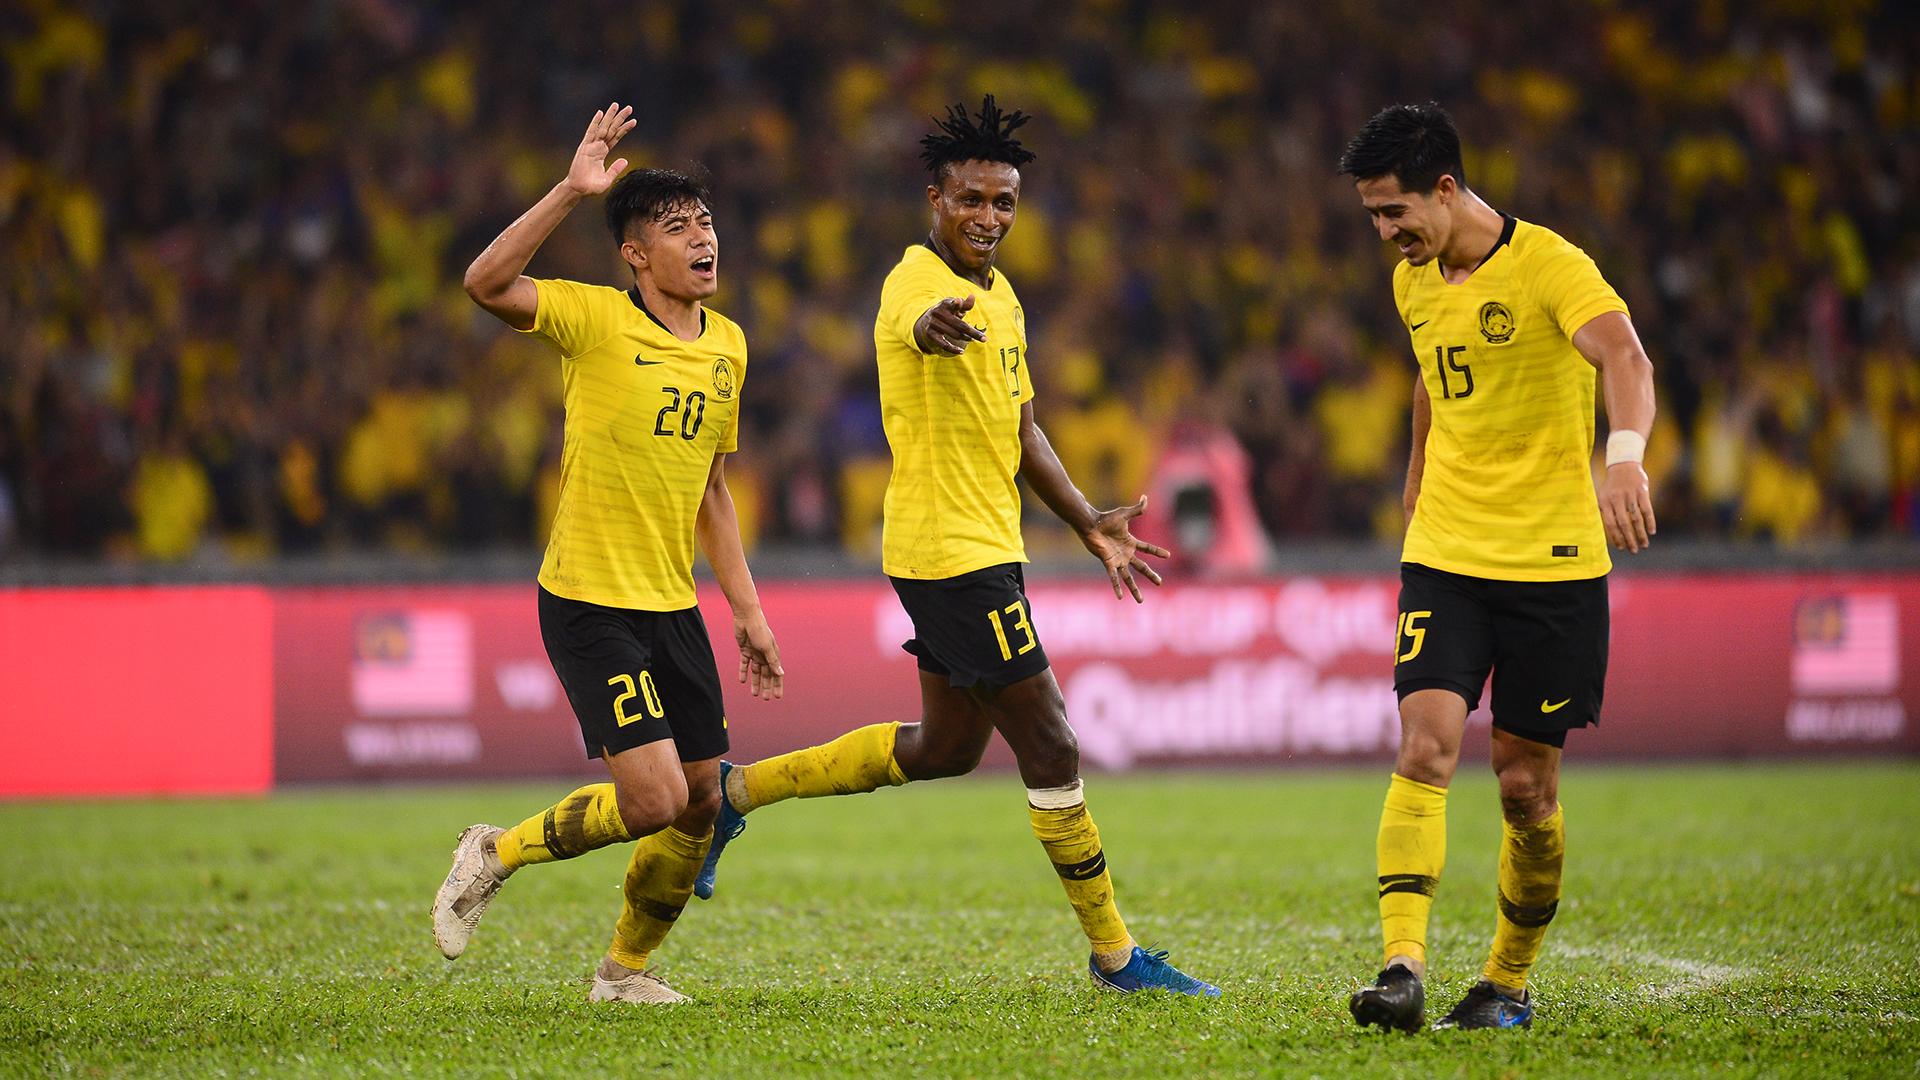 Syafiq Ahmad,Mohamadou Sumareh,Brendan Gan,马来西亚诉泰国,2022年世界杯预选赛,2019年11月14日